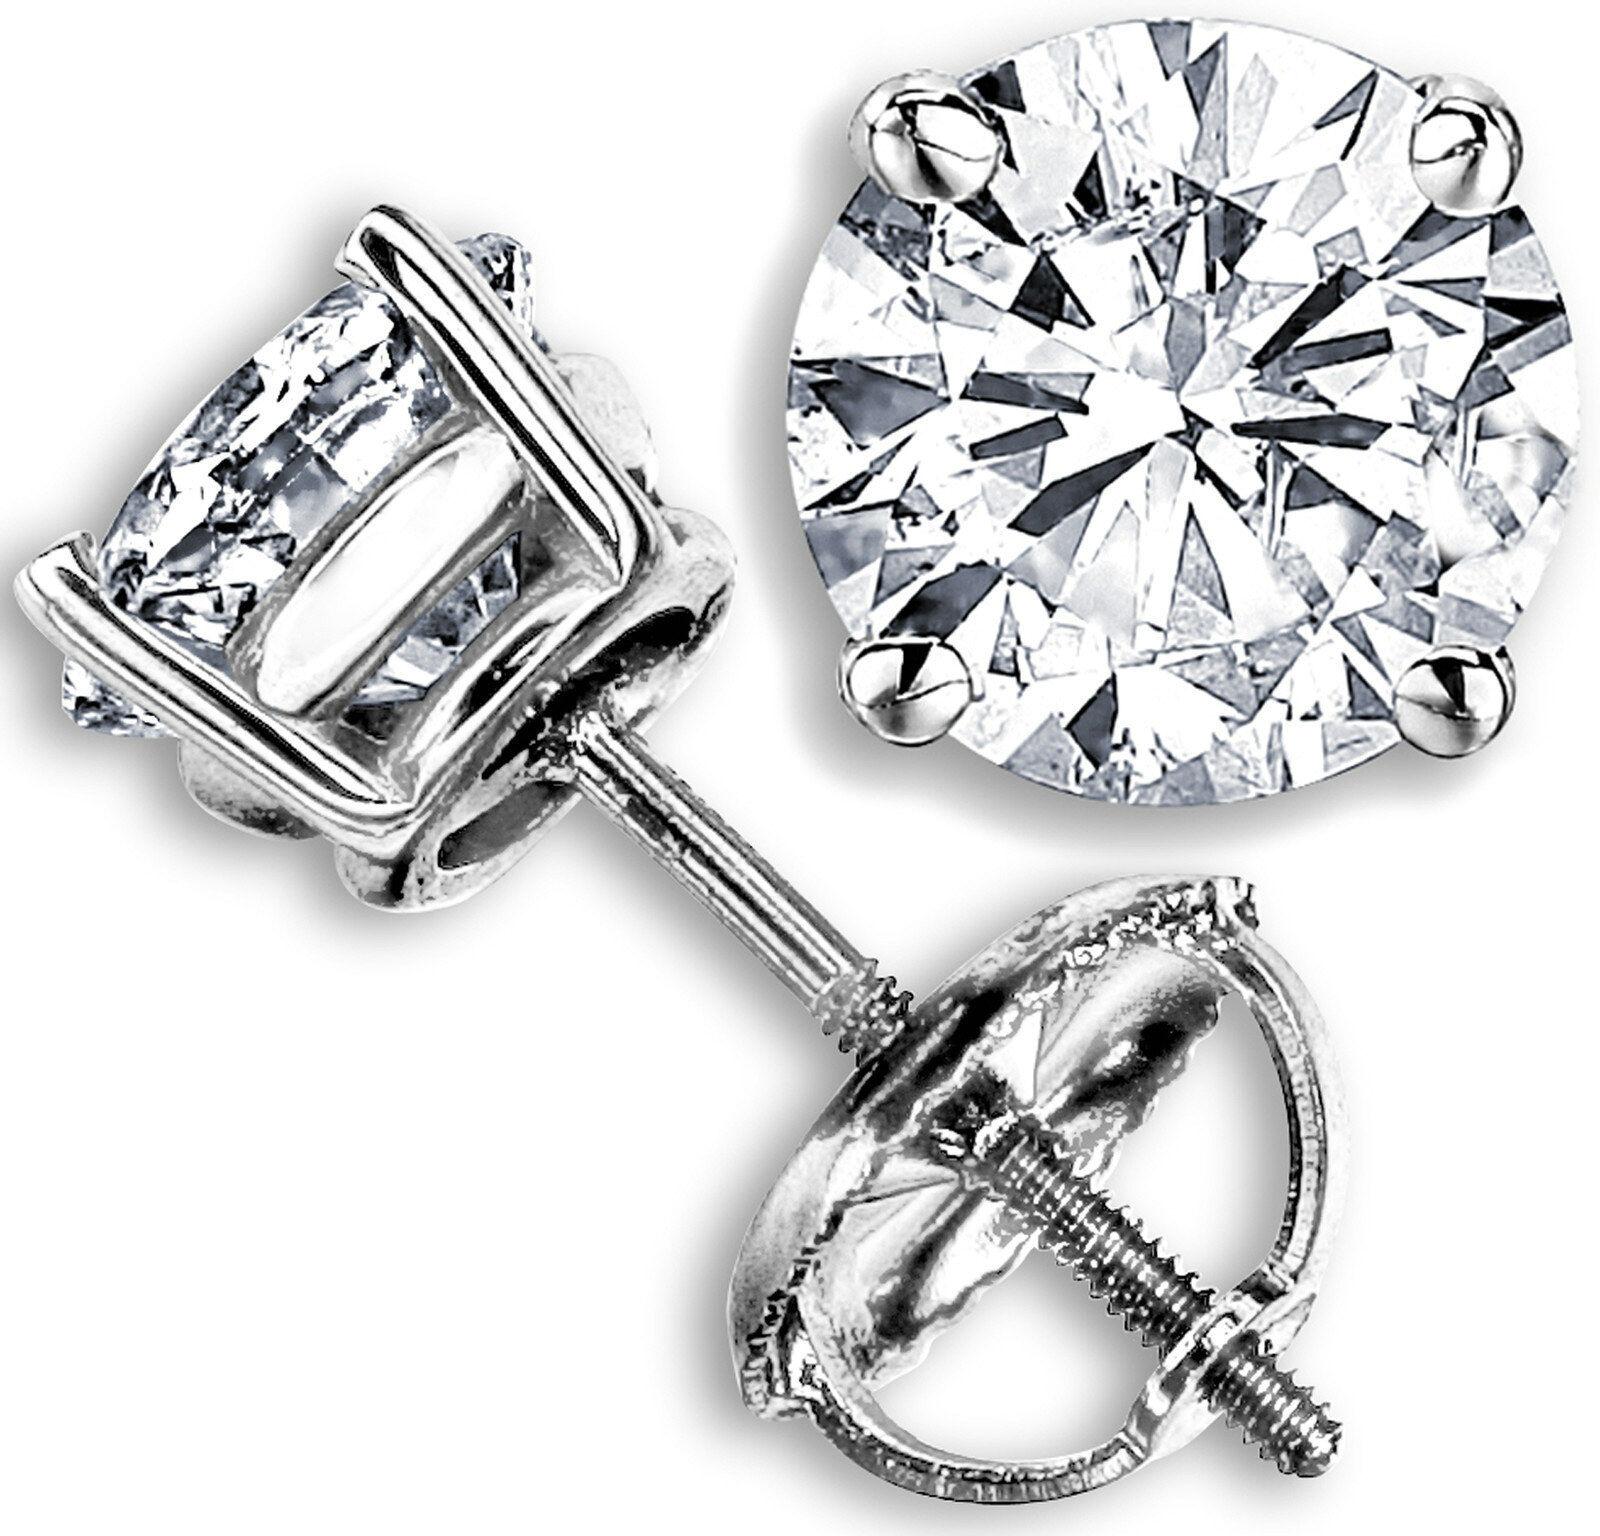 0.50 CT F-G SI GENUINE ROUND DIAMOND STUD EARRINGS 14K WHITE gold 100% NATURAL